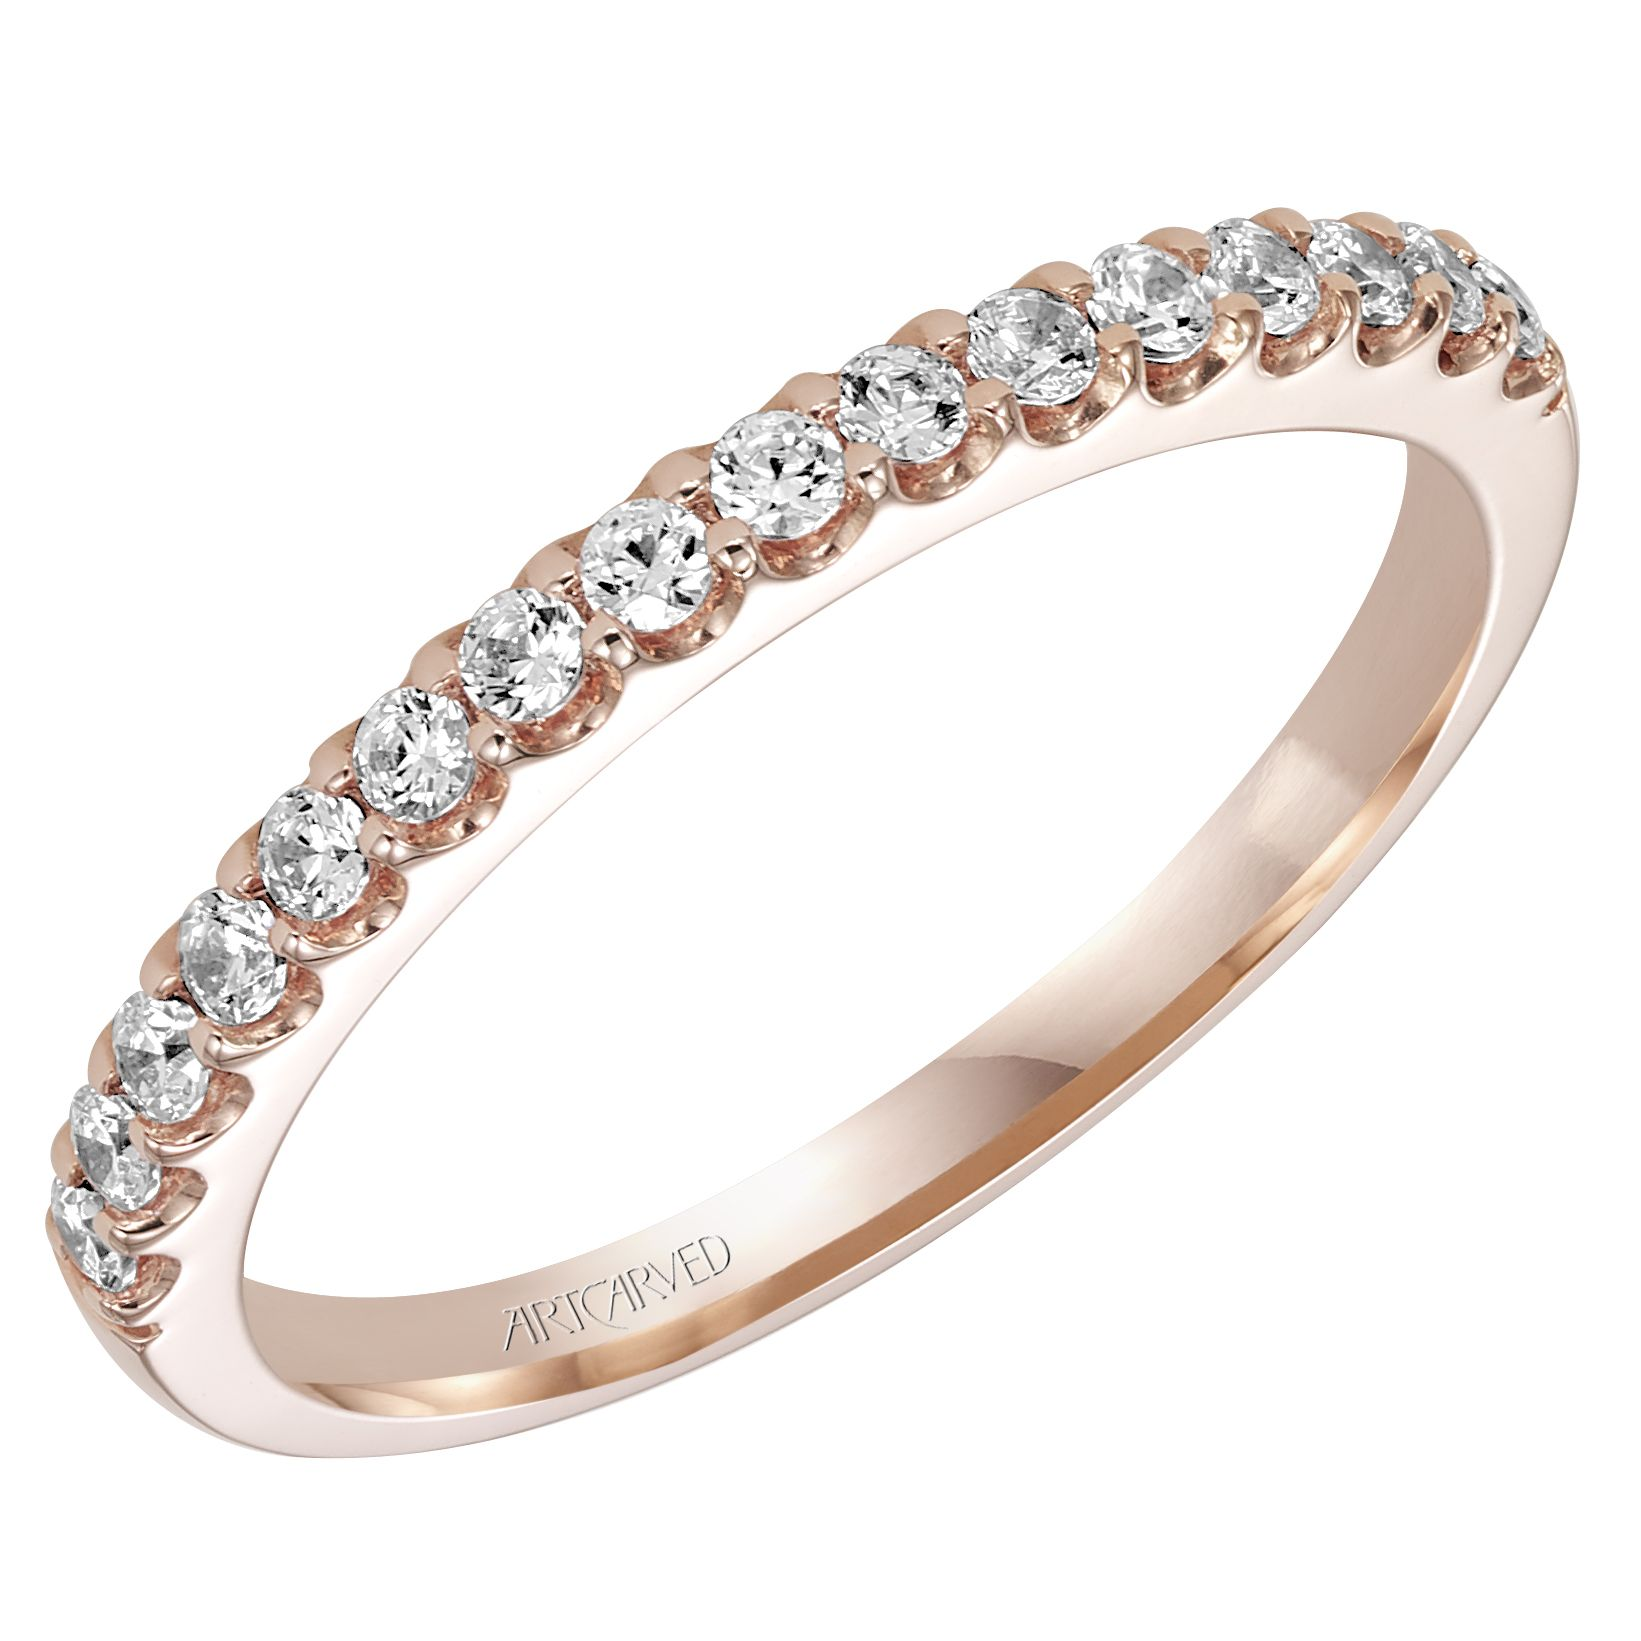 Rose gold diamond wedding band or anniversary band. Style